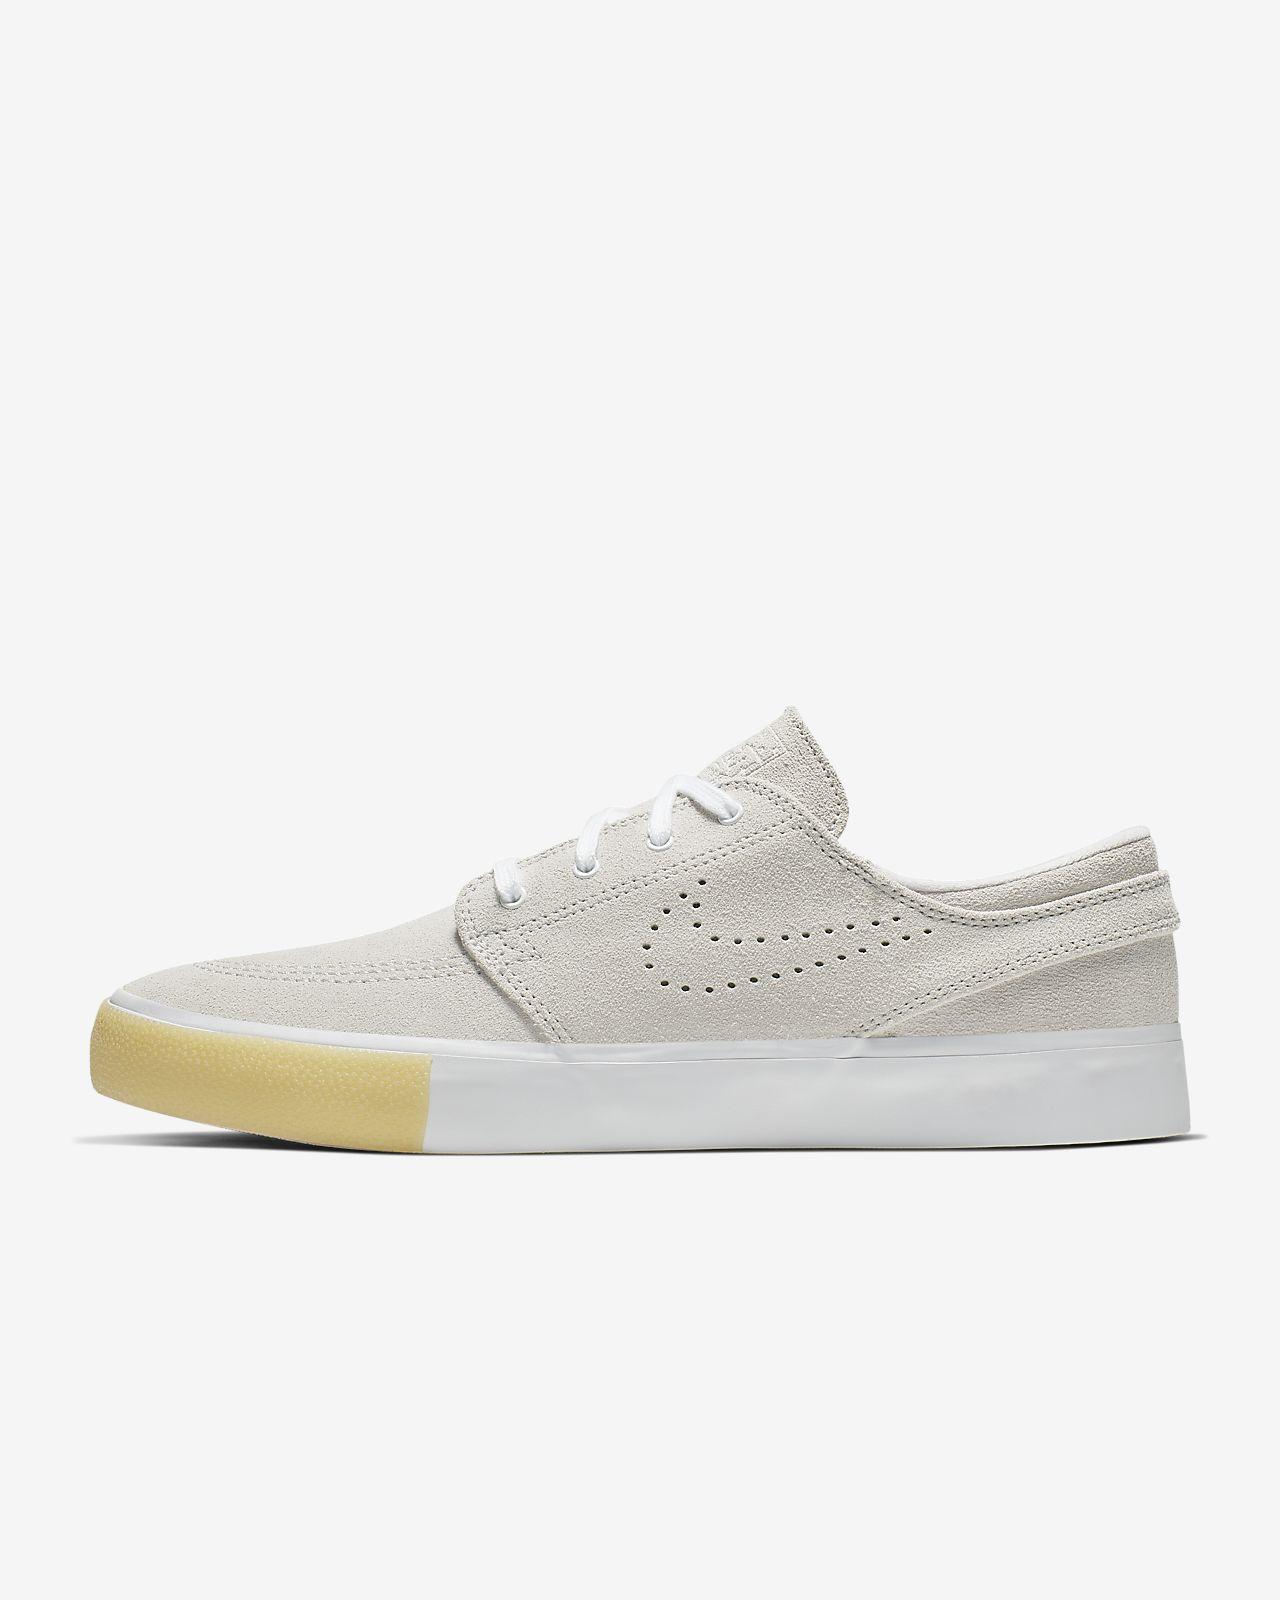 Skateboardsko Nike SB Zoom Stefan Janoski RM SE